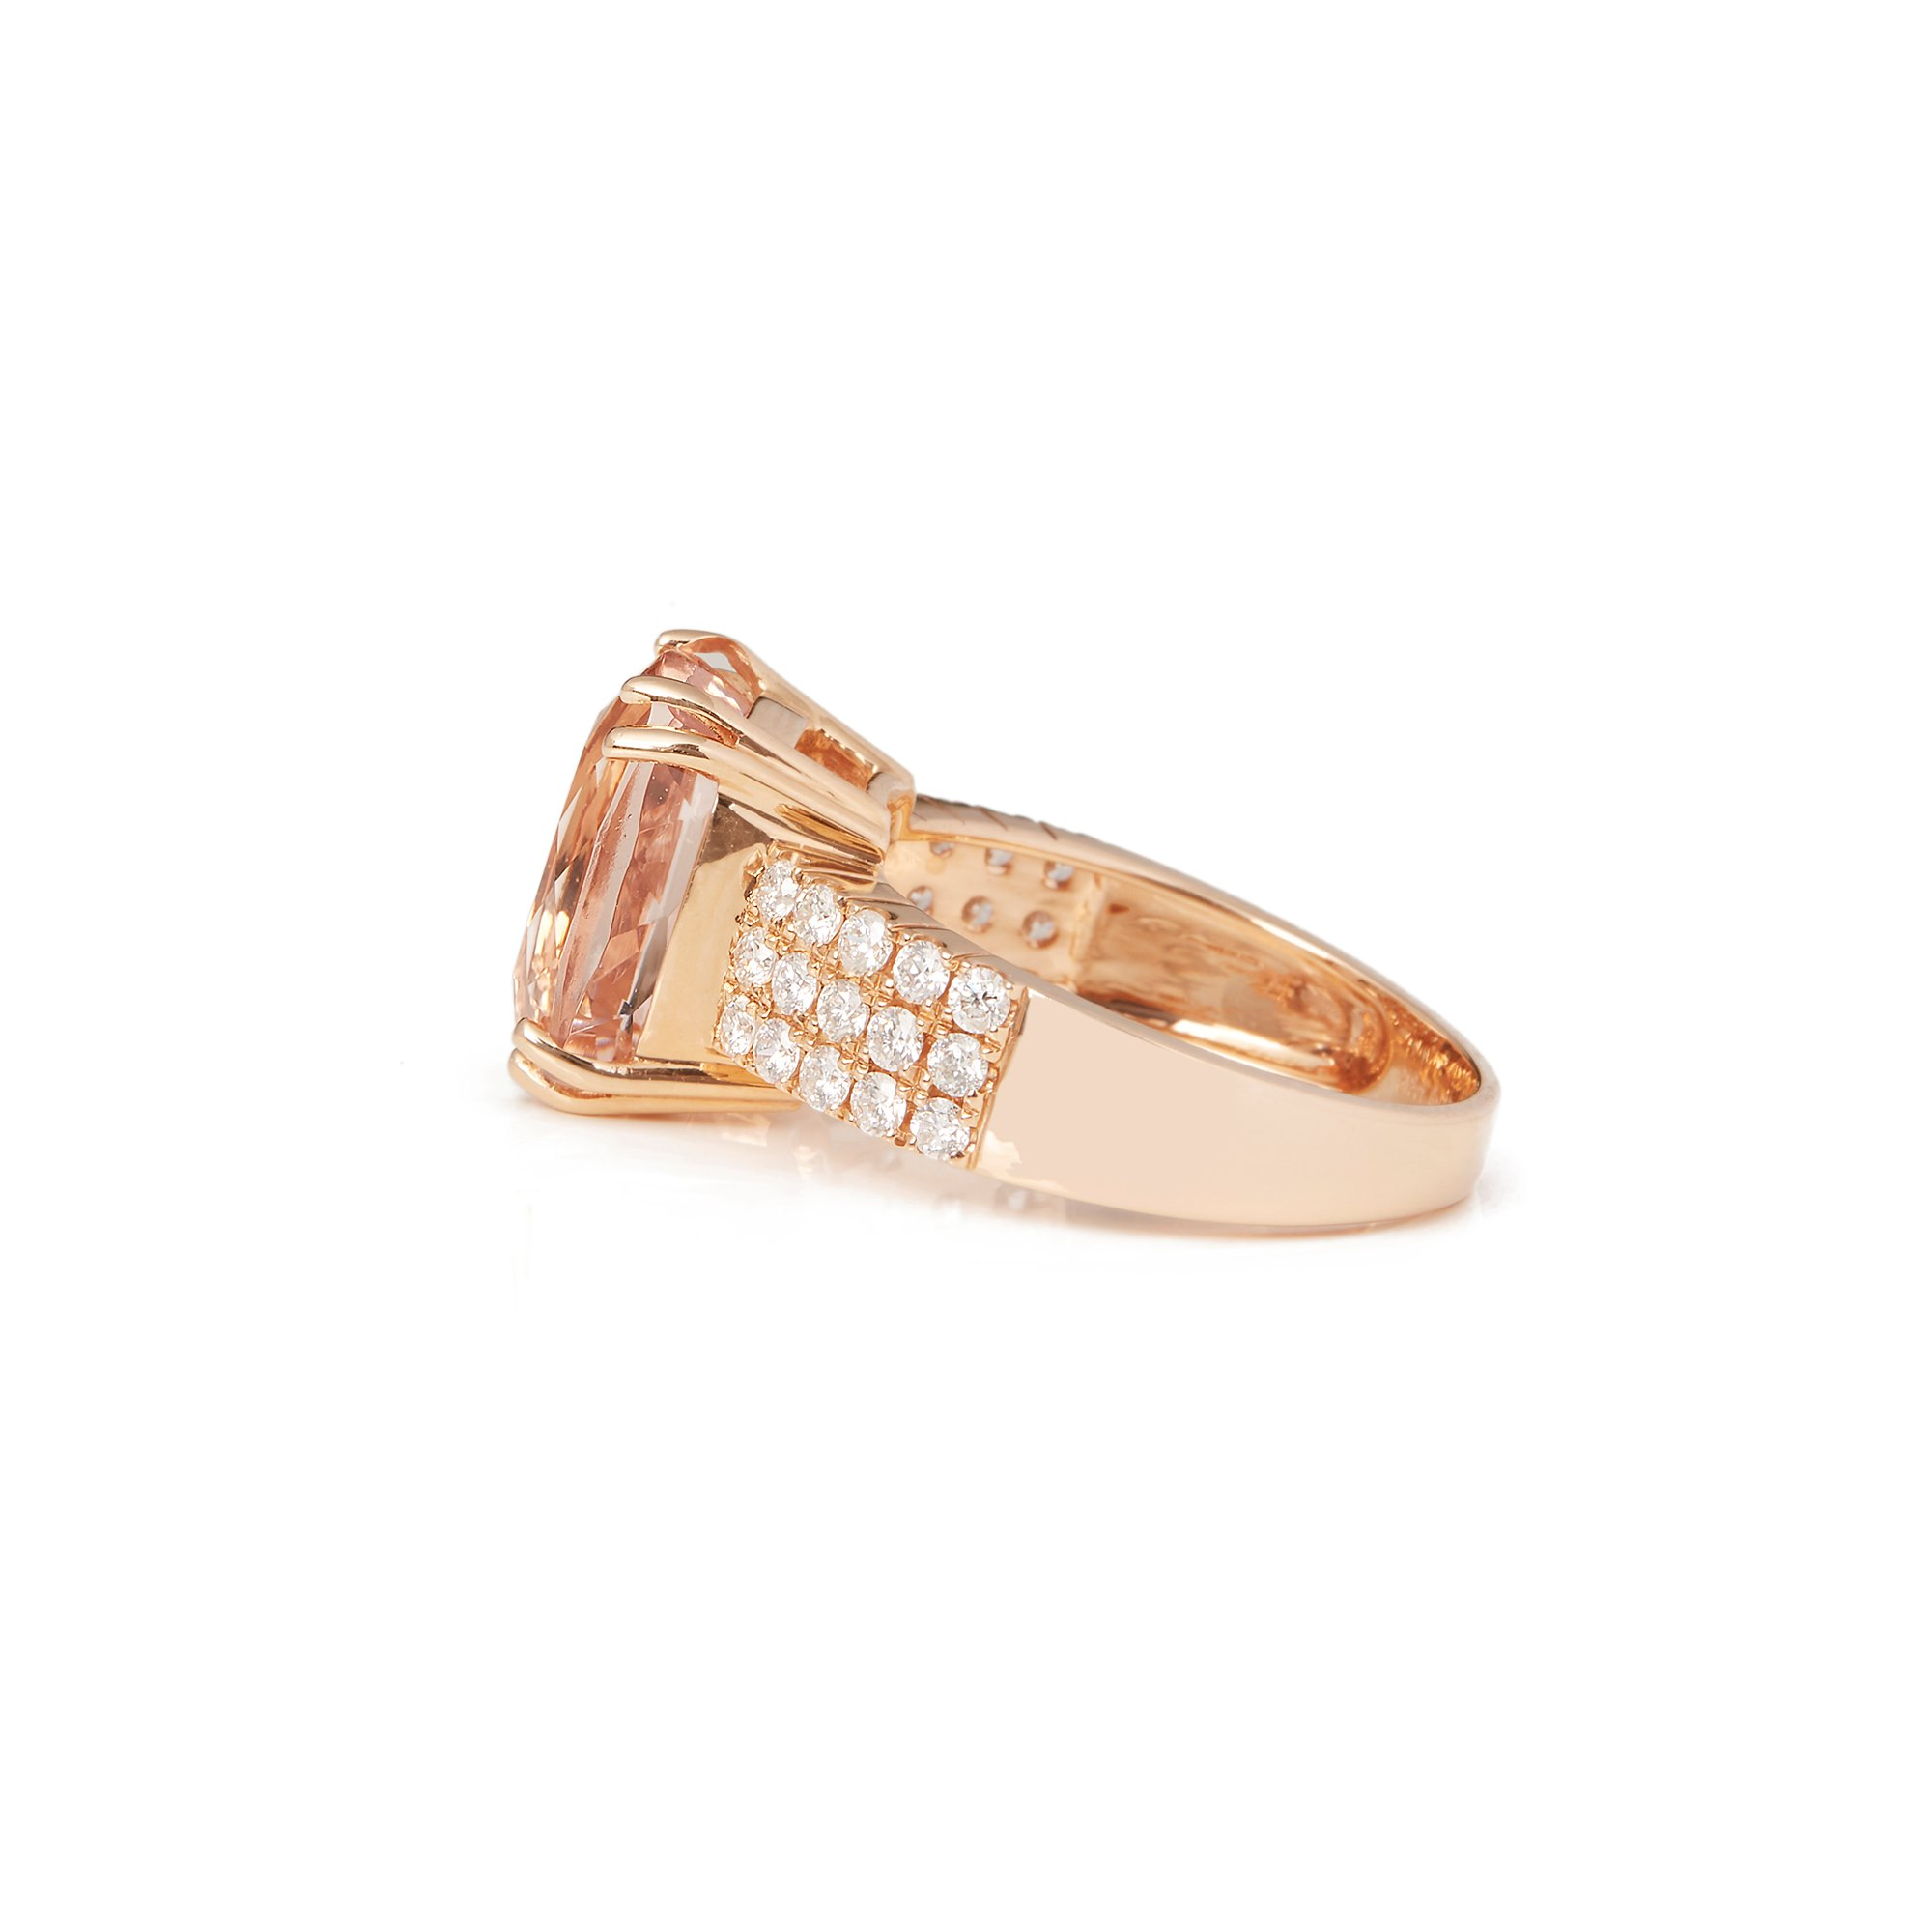 David Jerome 18k Rose Gold Morganite and Diamond Ring